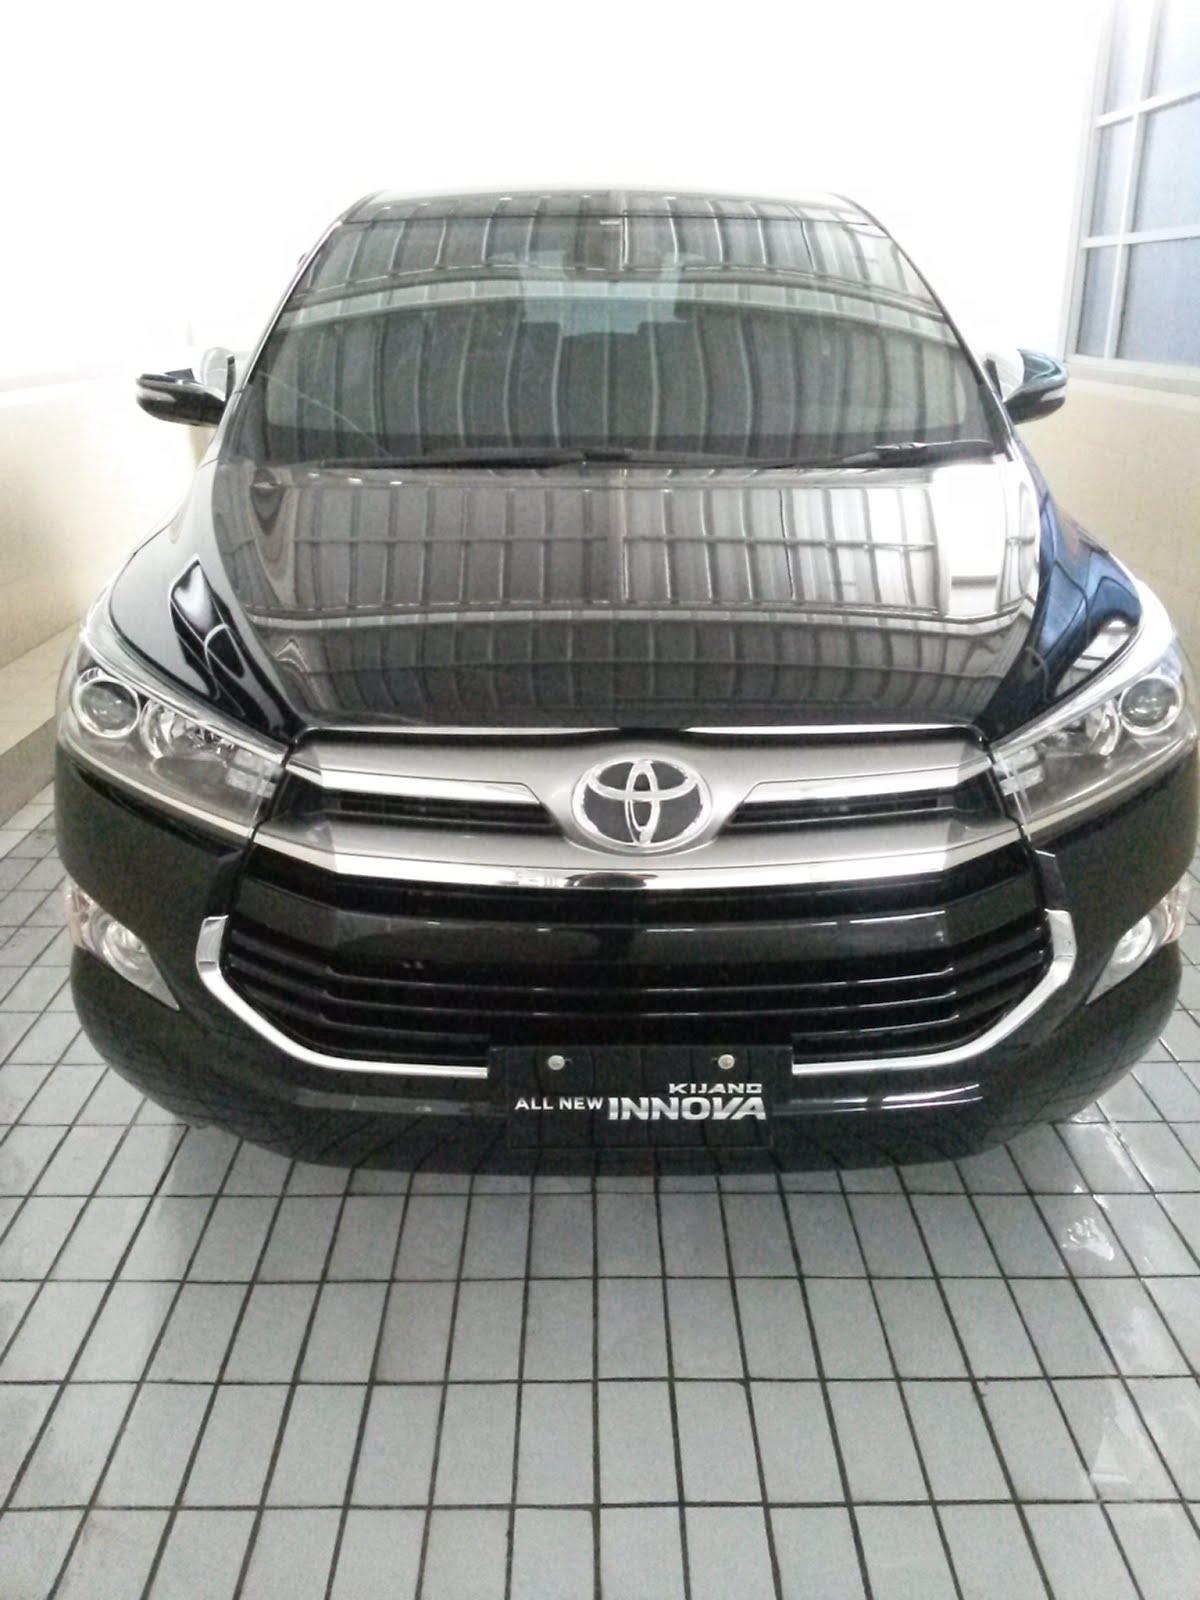 Kapan All New Camry Masuk Indonesia Toyota Grand Veloz 2015 Innova 2016 Jakarta Pusat